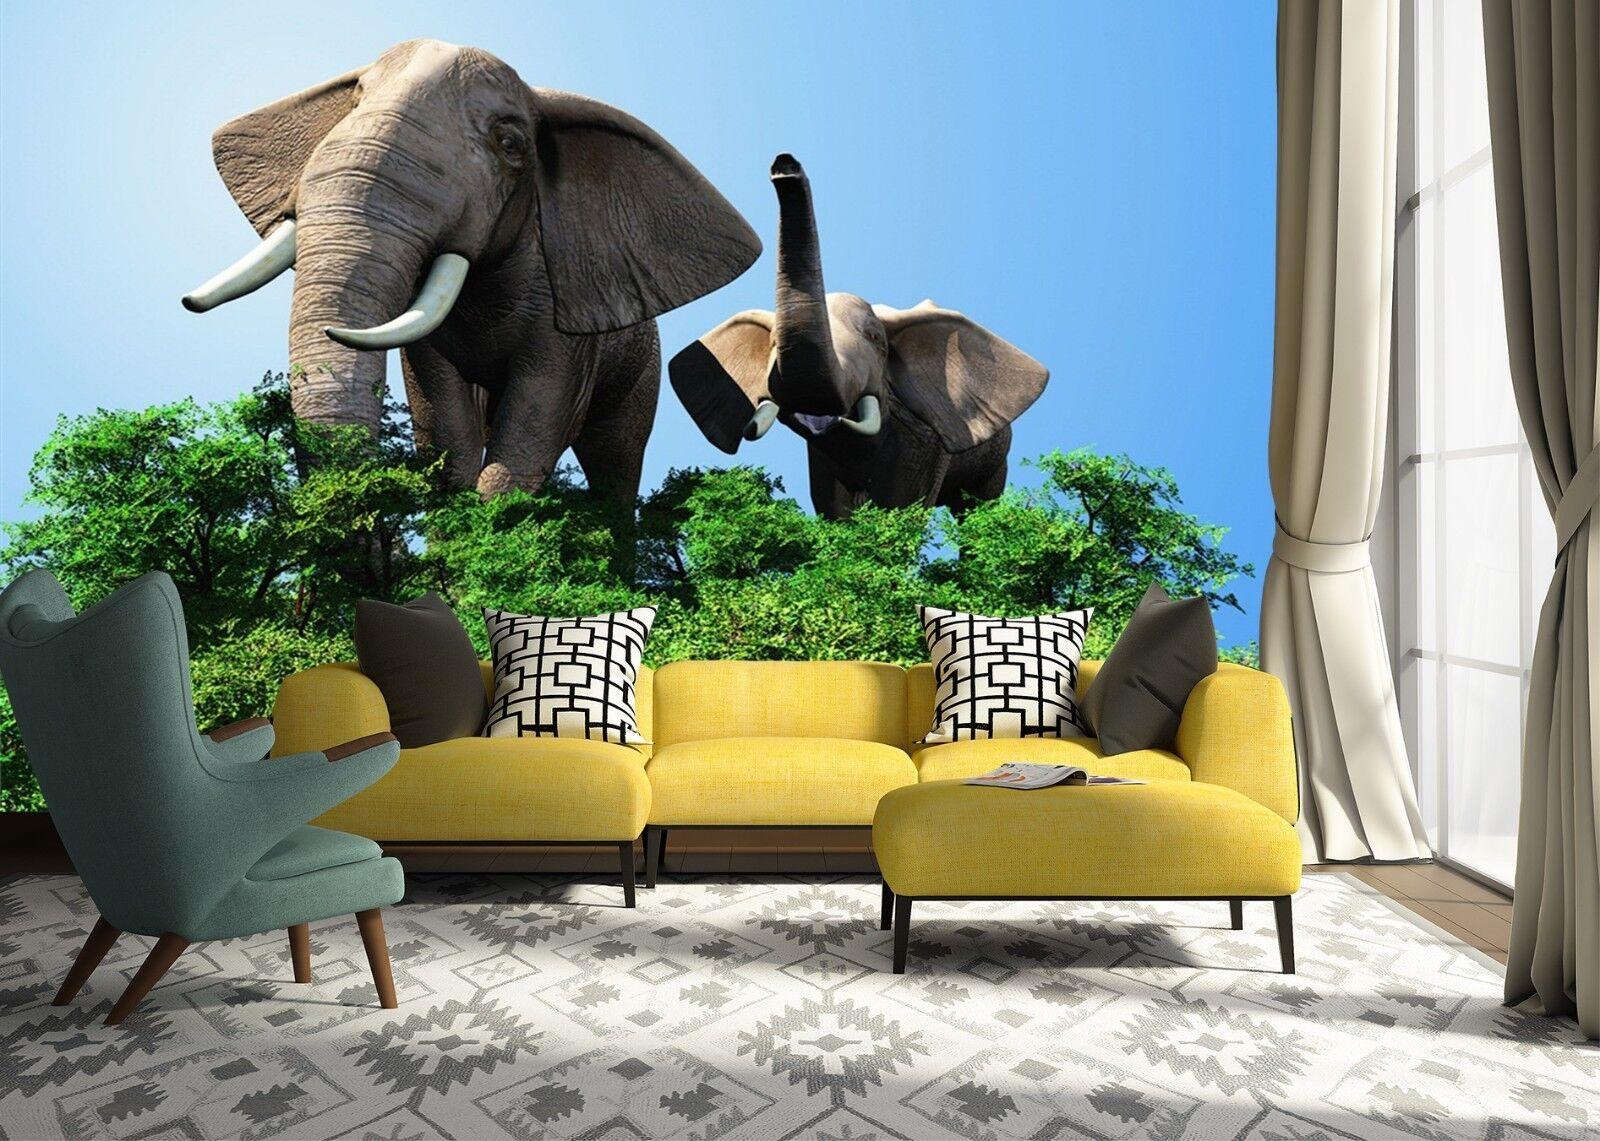 3D Grün Tree Elephant 6 Wall Paper wall Print Decal Wall Deco Indoor wall Mural